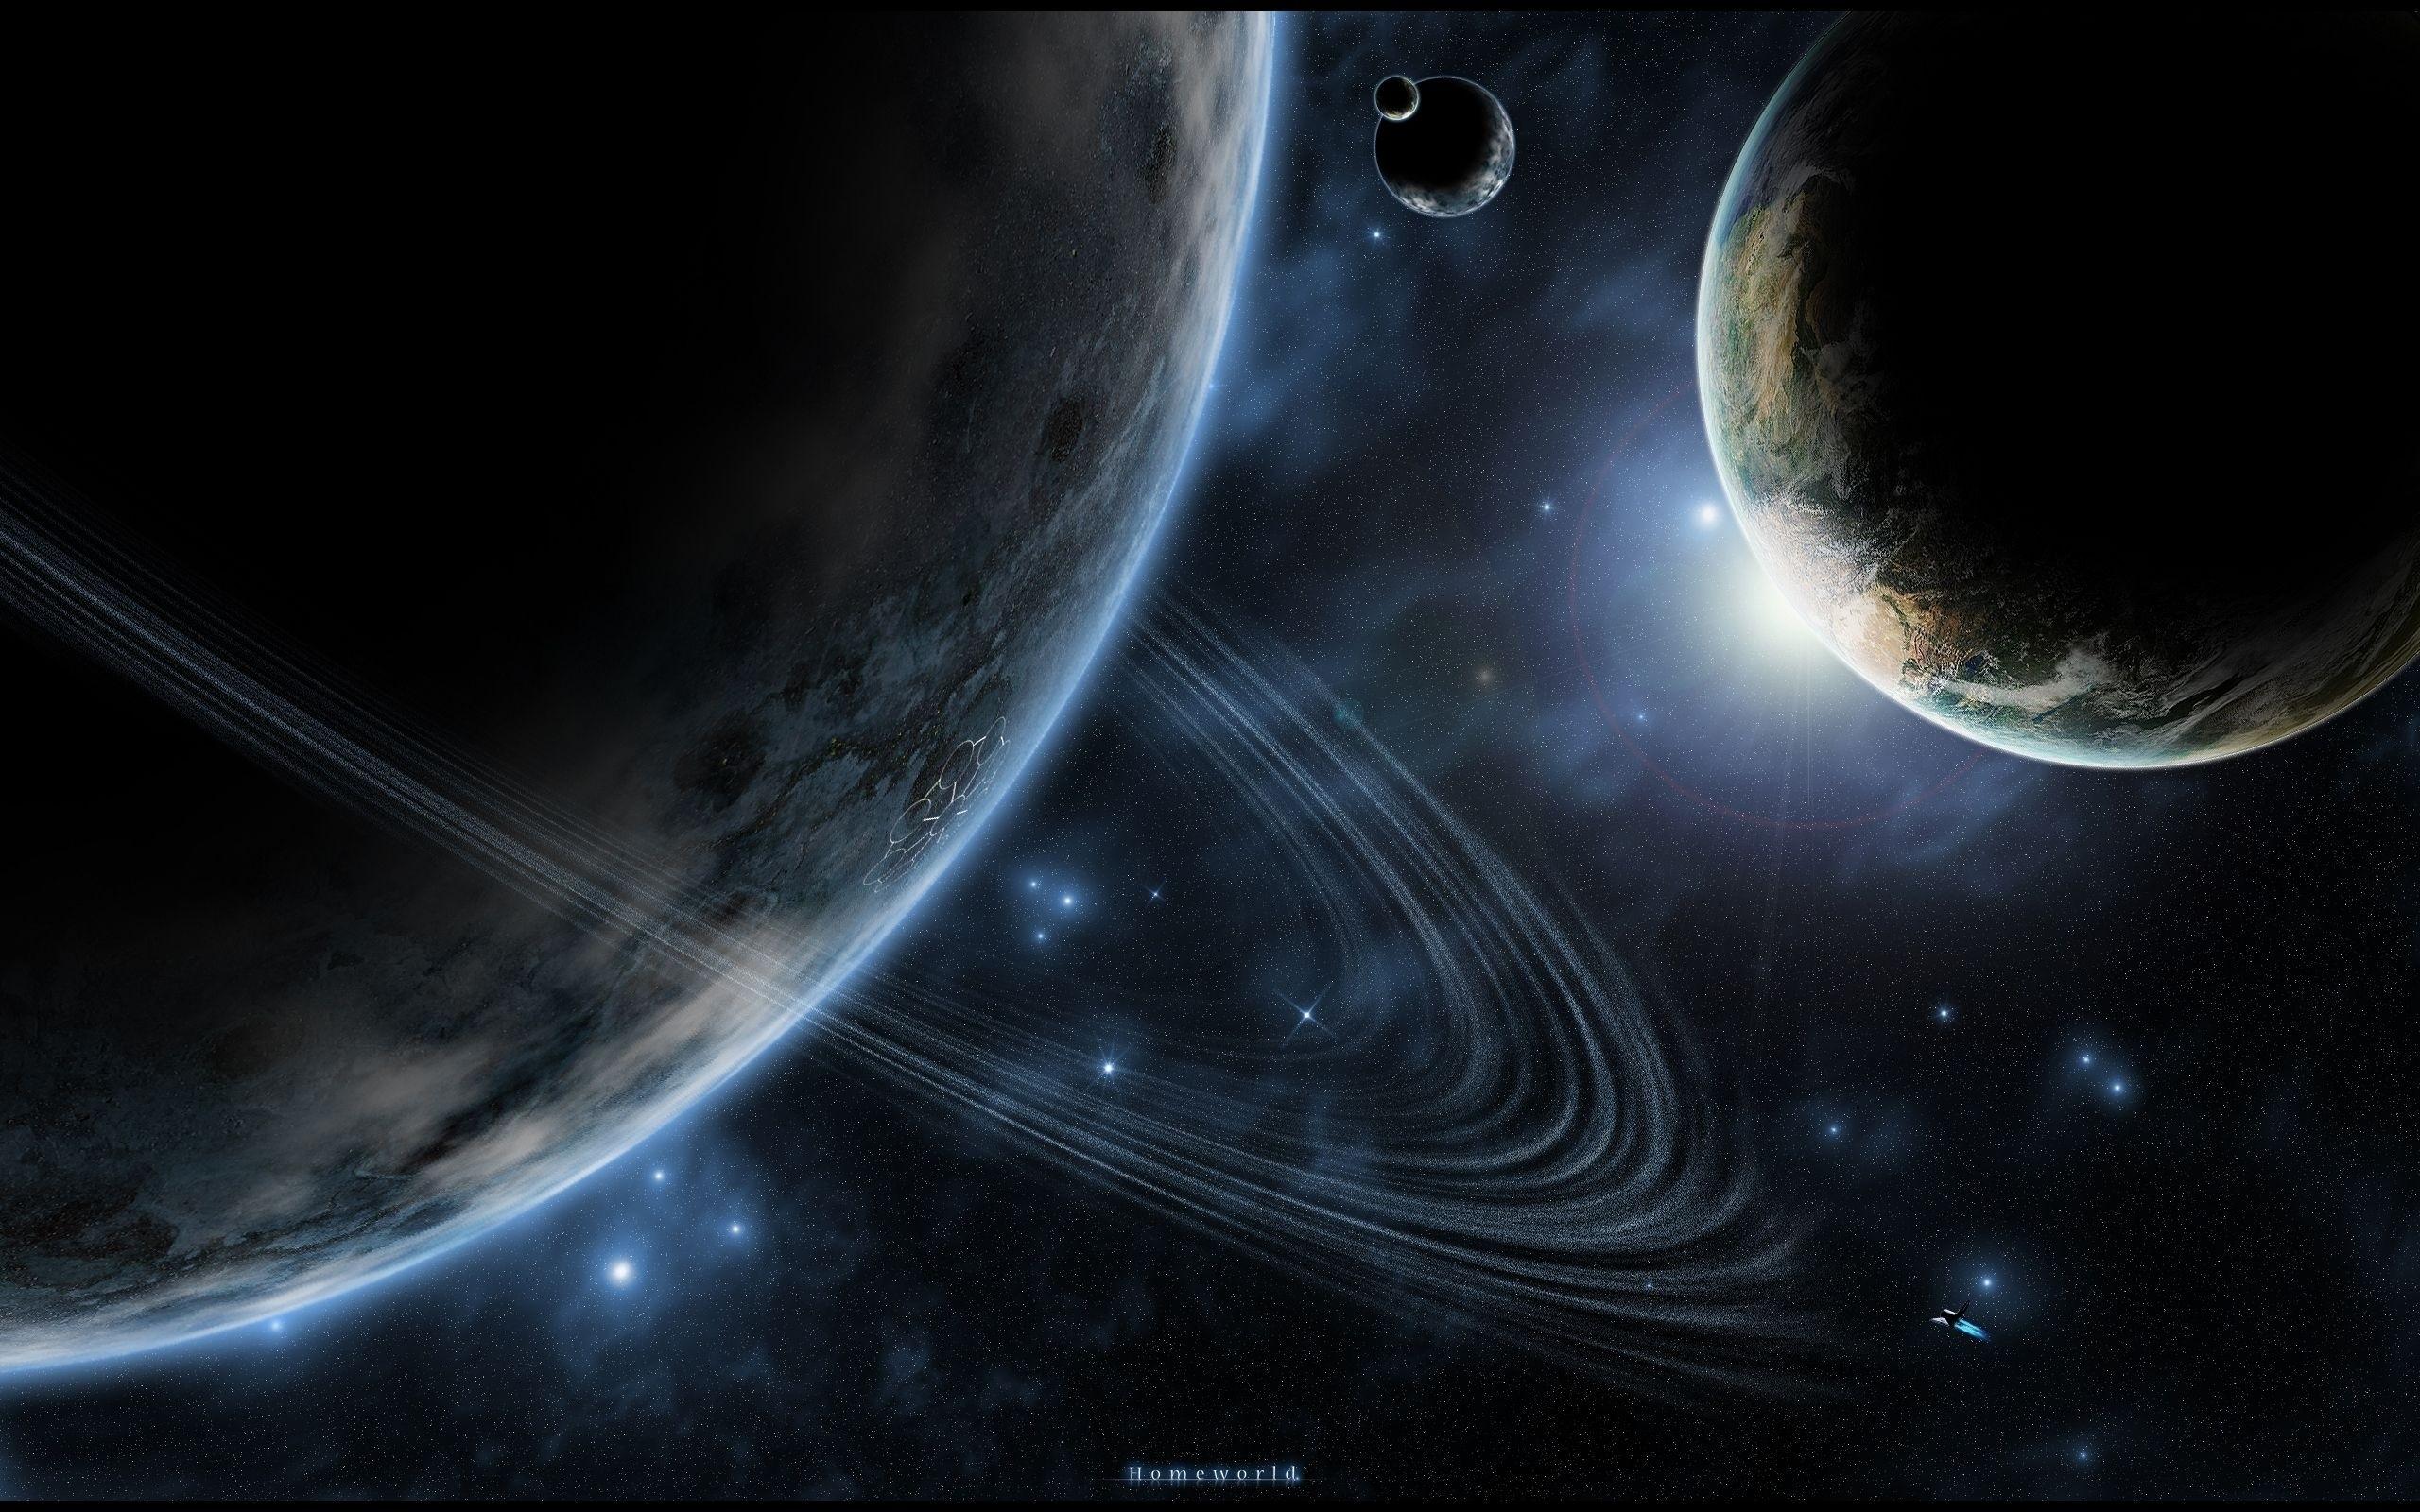 Space wallpaper – 1071700